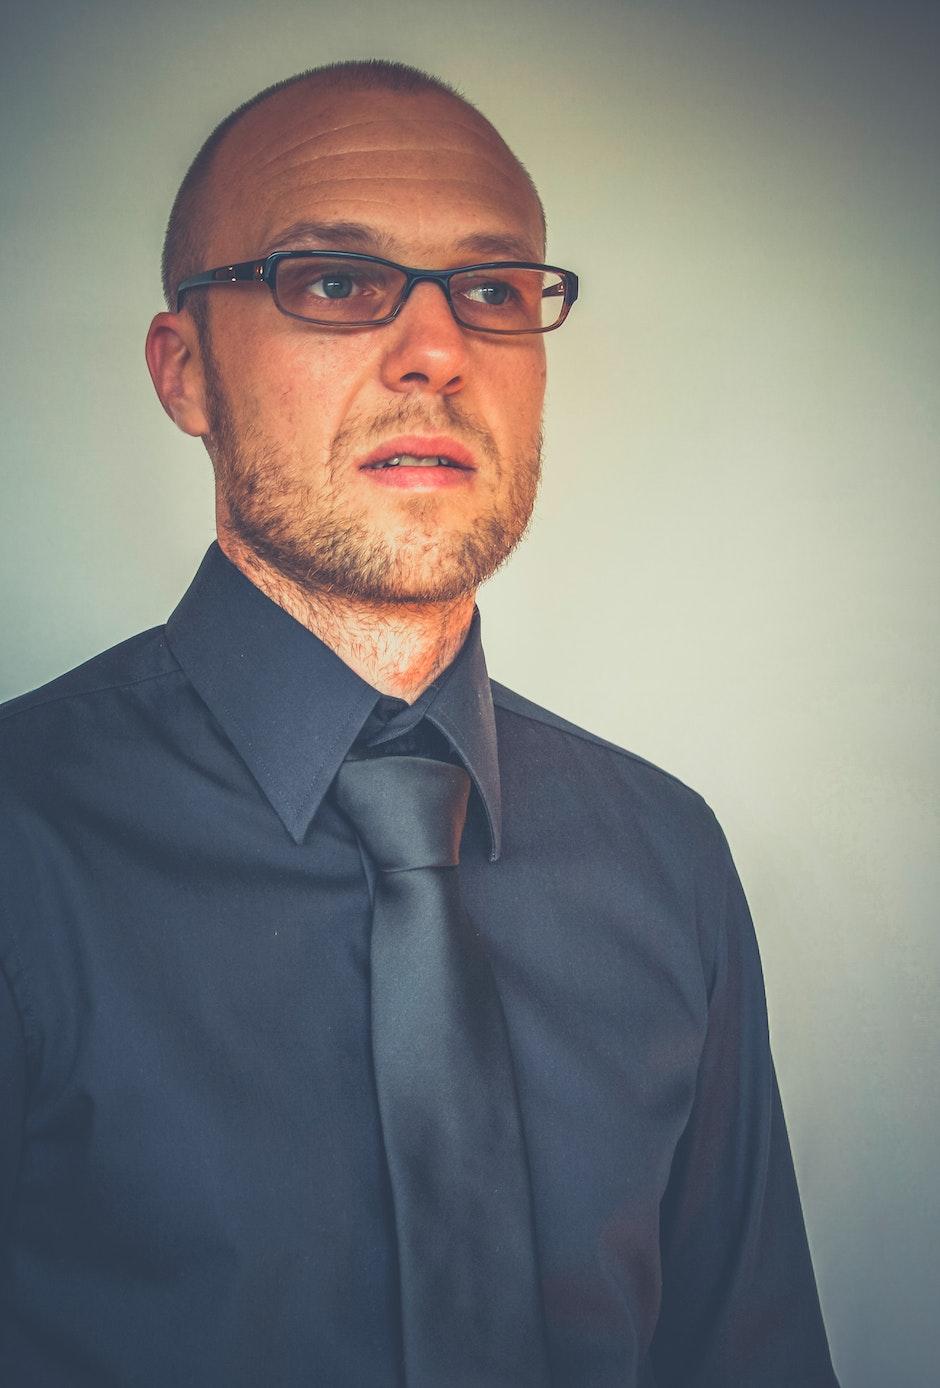 adult, eye glasses, man